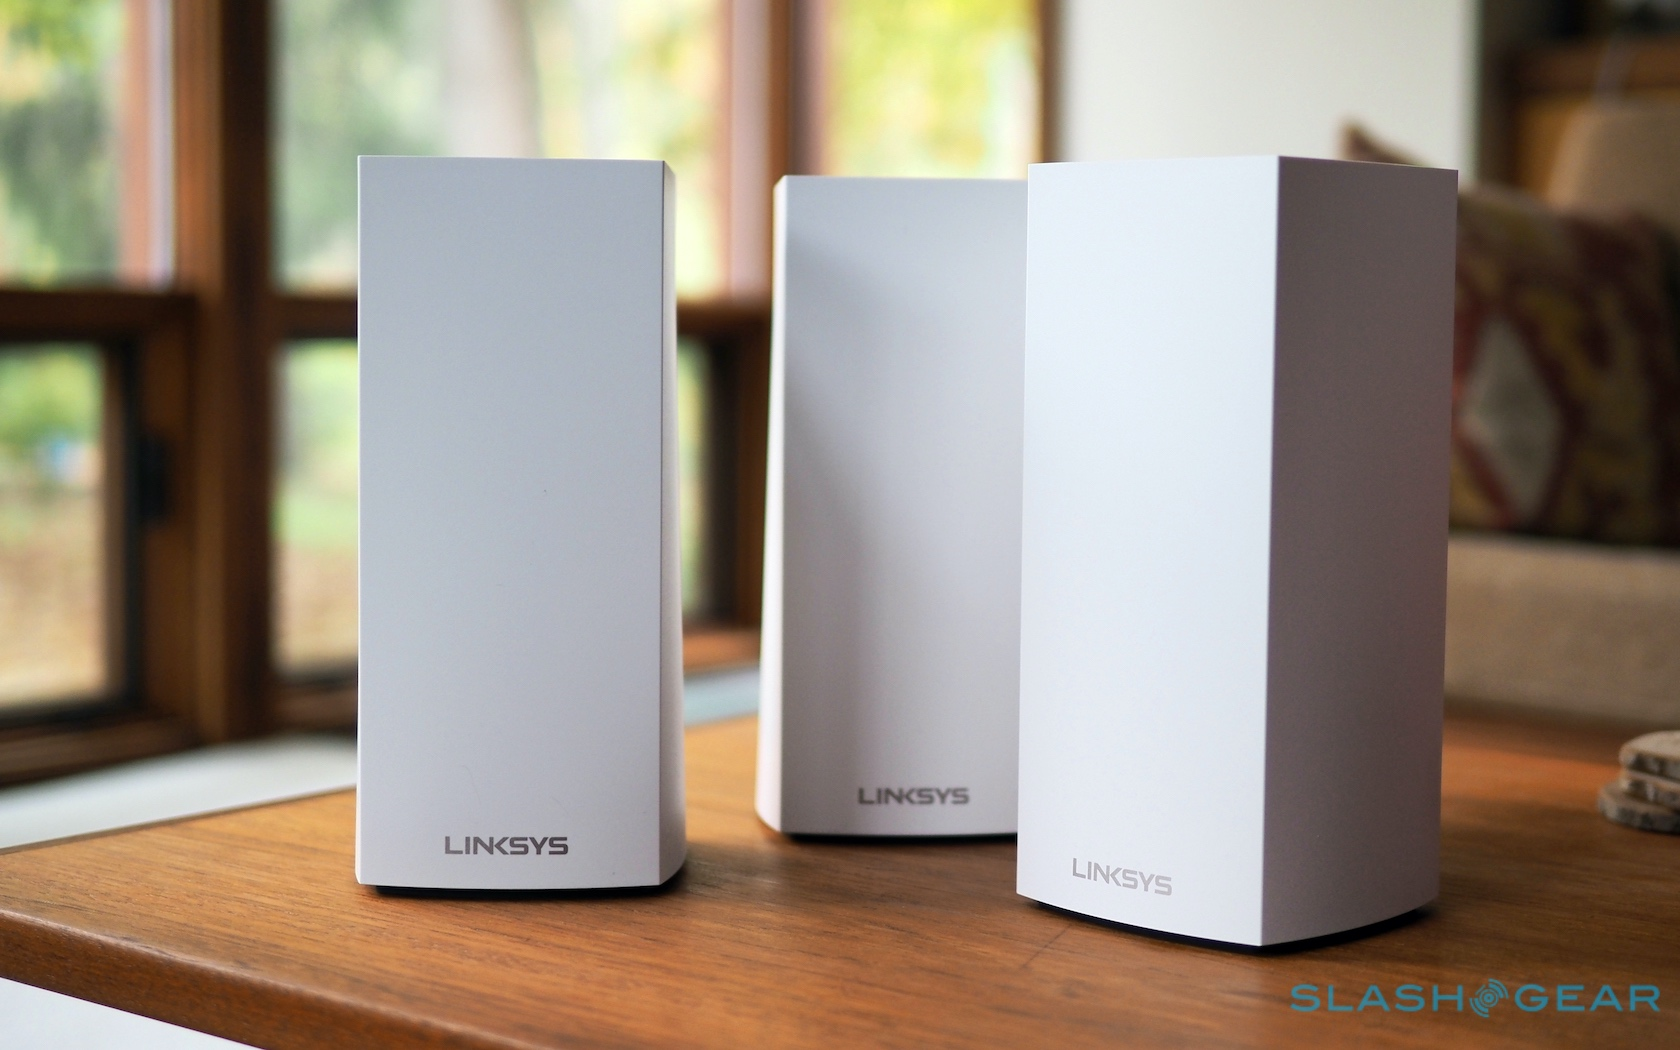 Linksys' Velop AX4200 WiFi 6 mesh sets sights on 8K and next-gen consoles - SlashGear